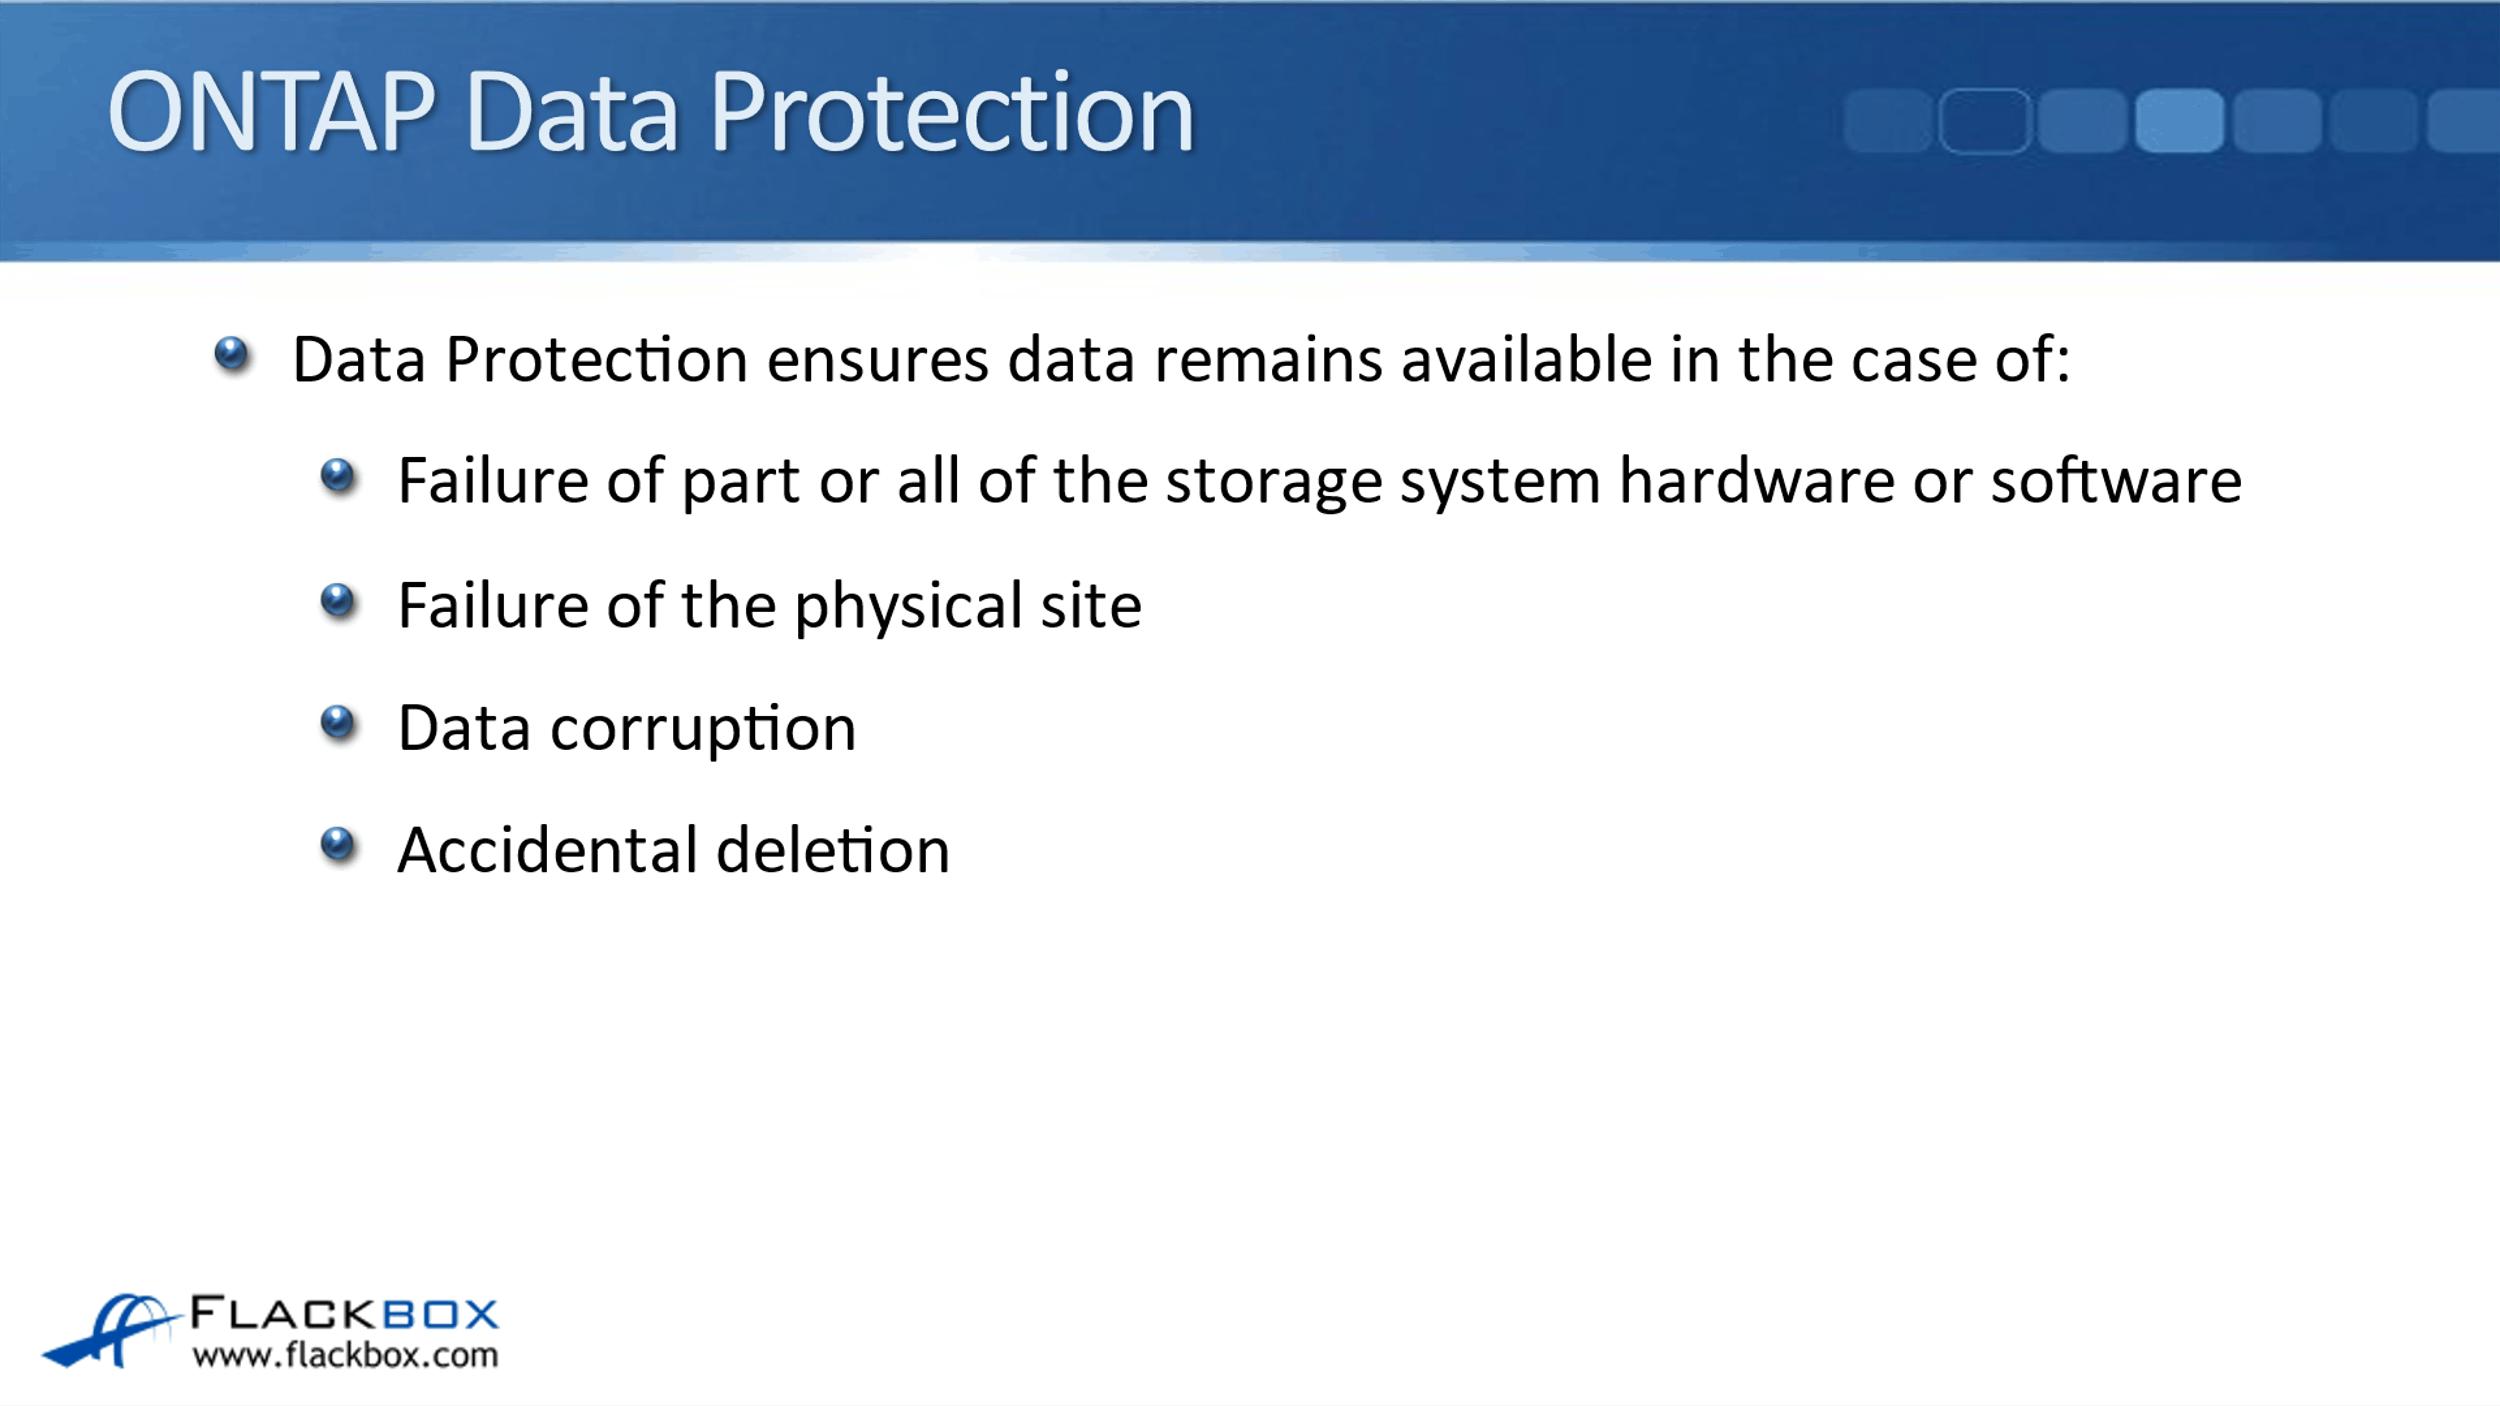 NetApp Data Protection Overview